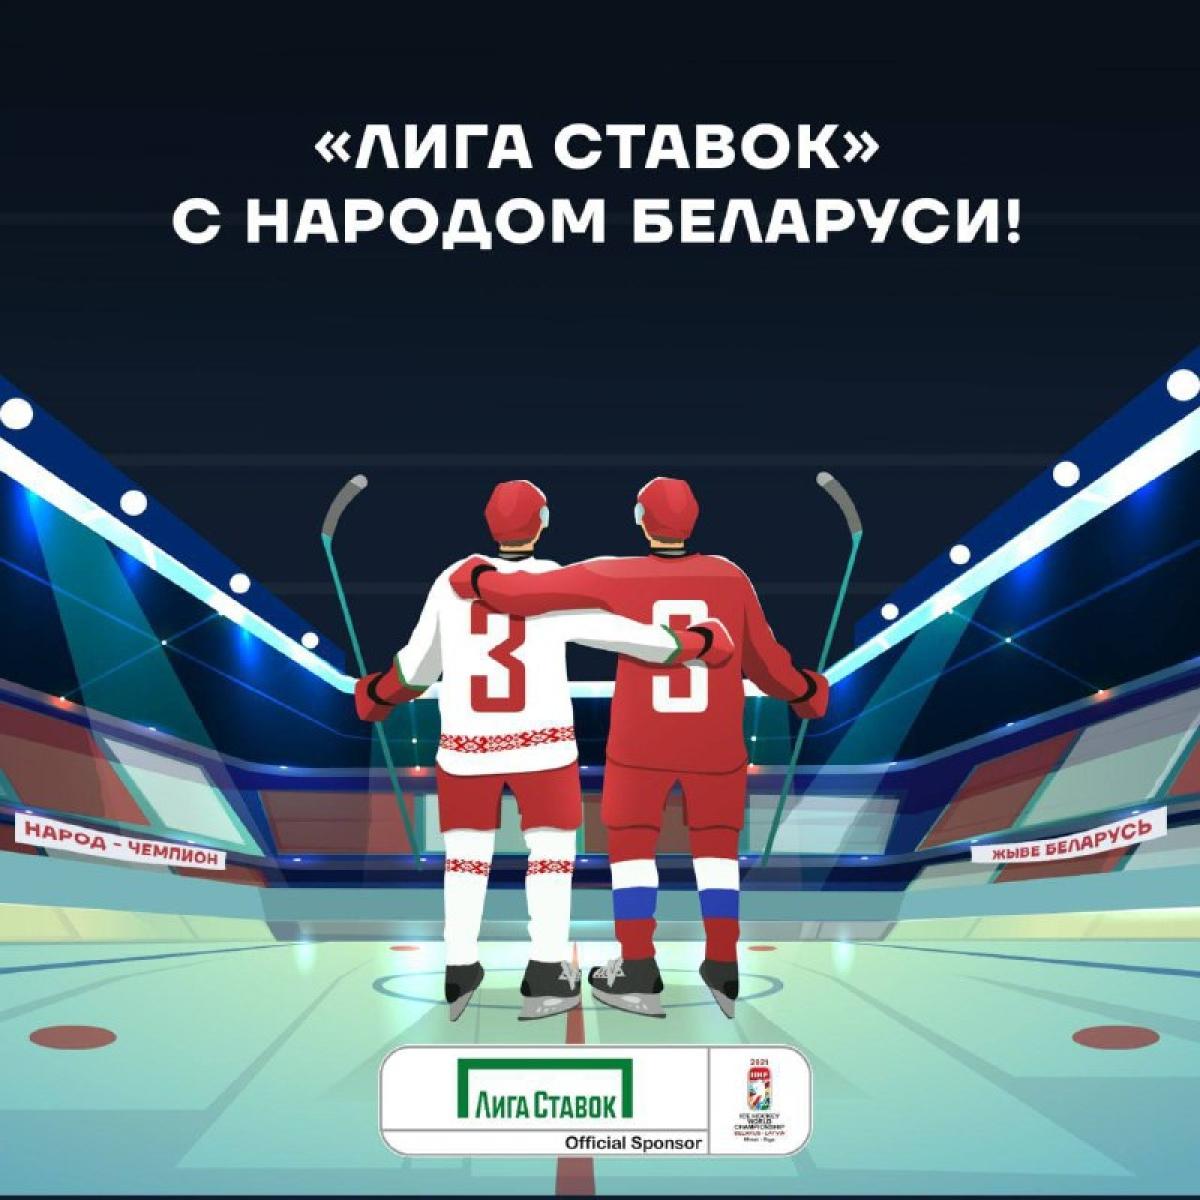 «Лига Ставок» поддерживает народ Беларуси